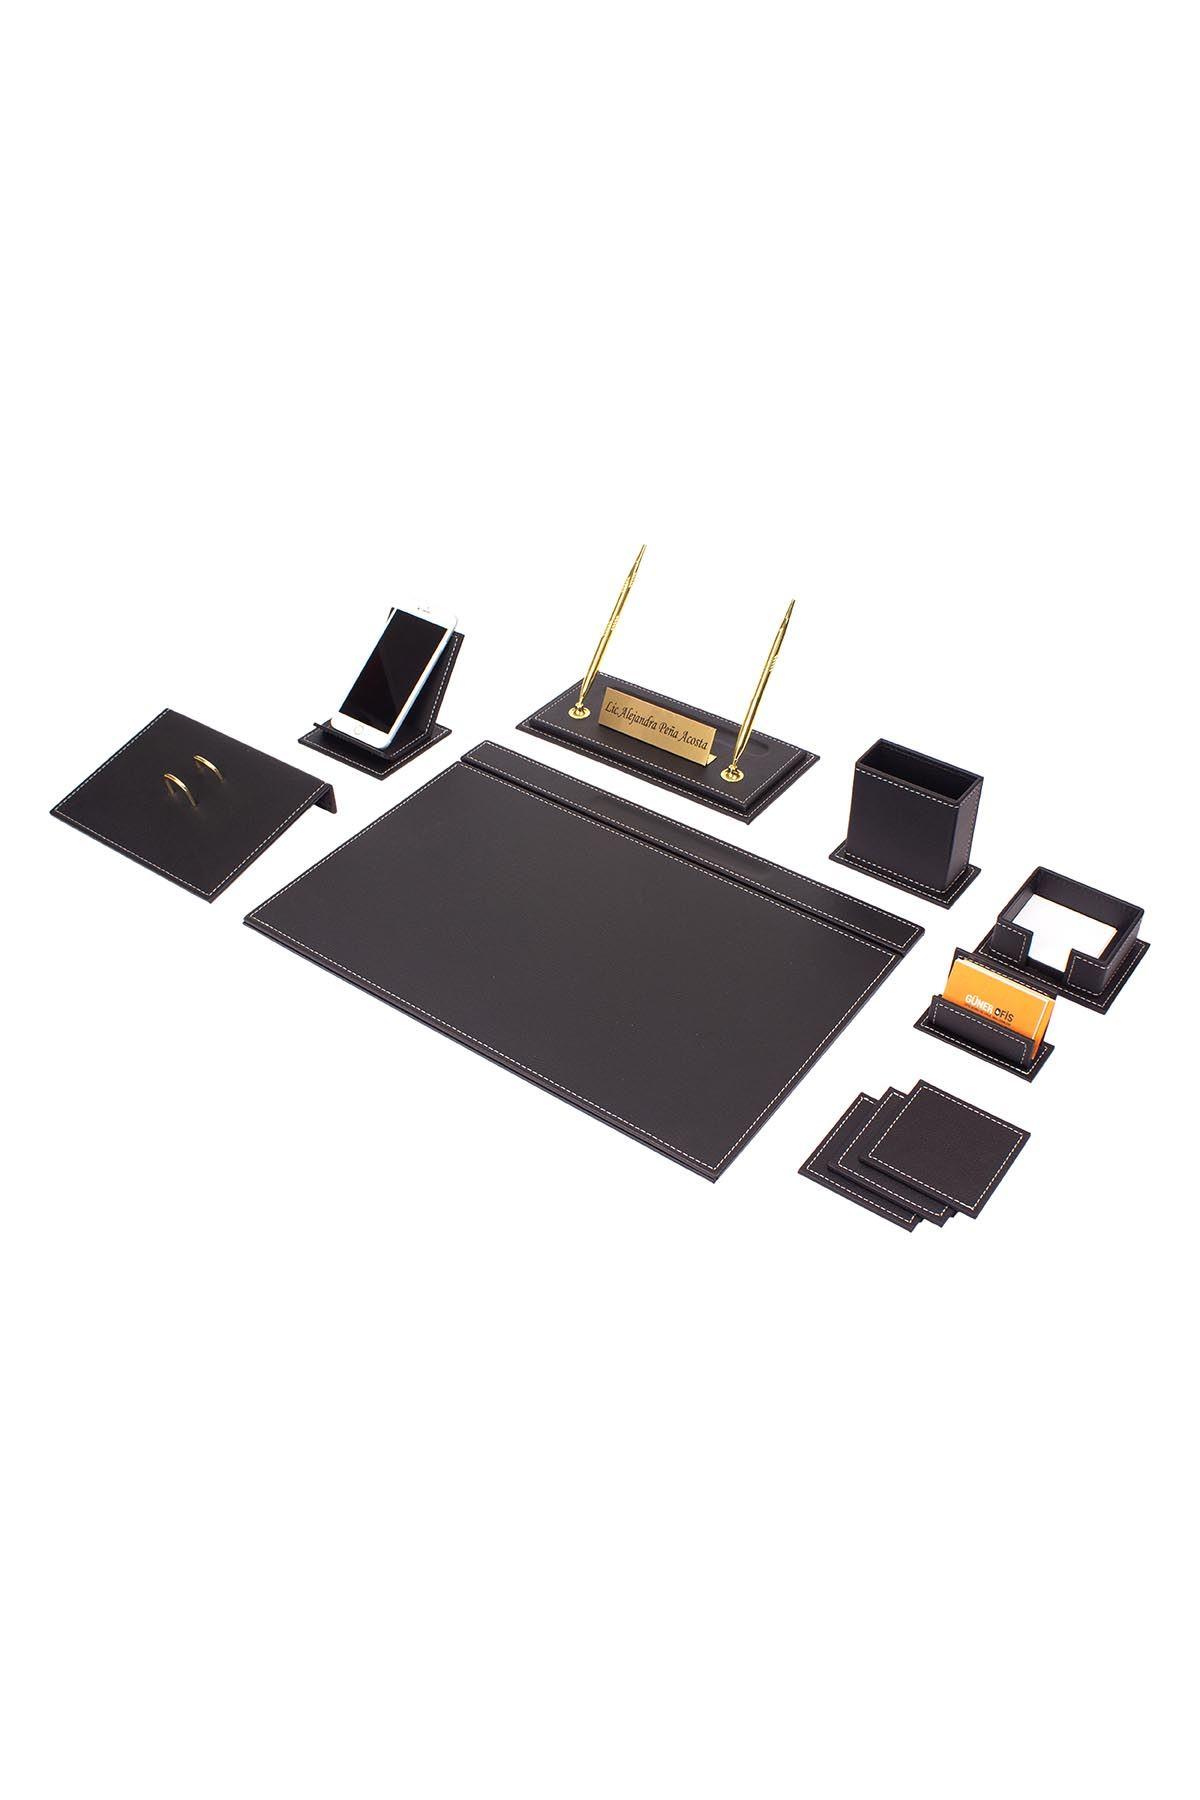 Vega Leather Desk Set Black 12 Accessories